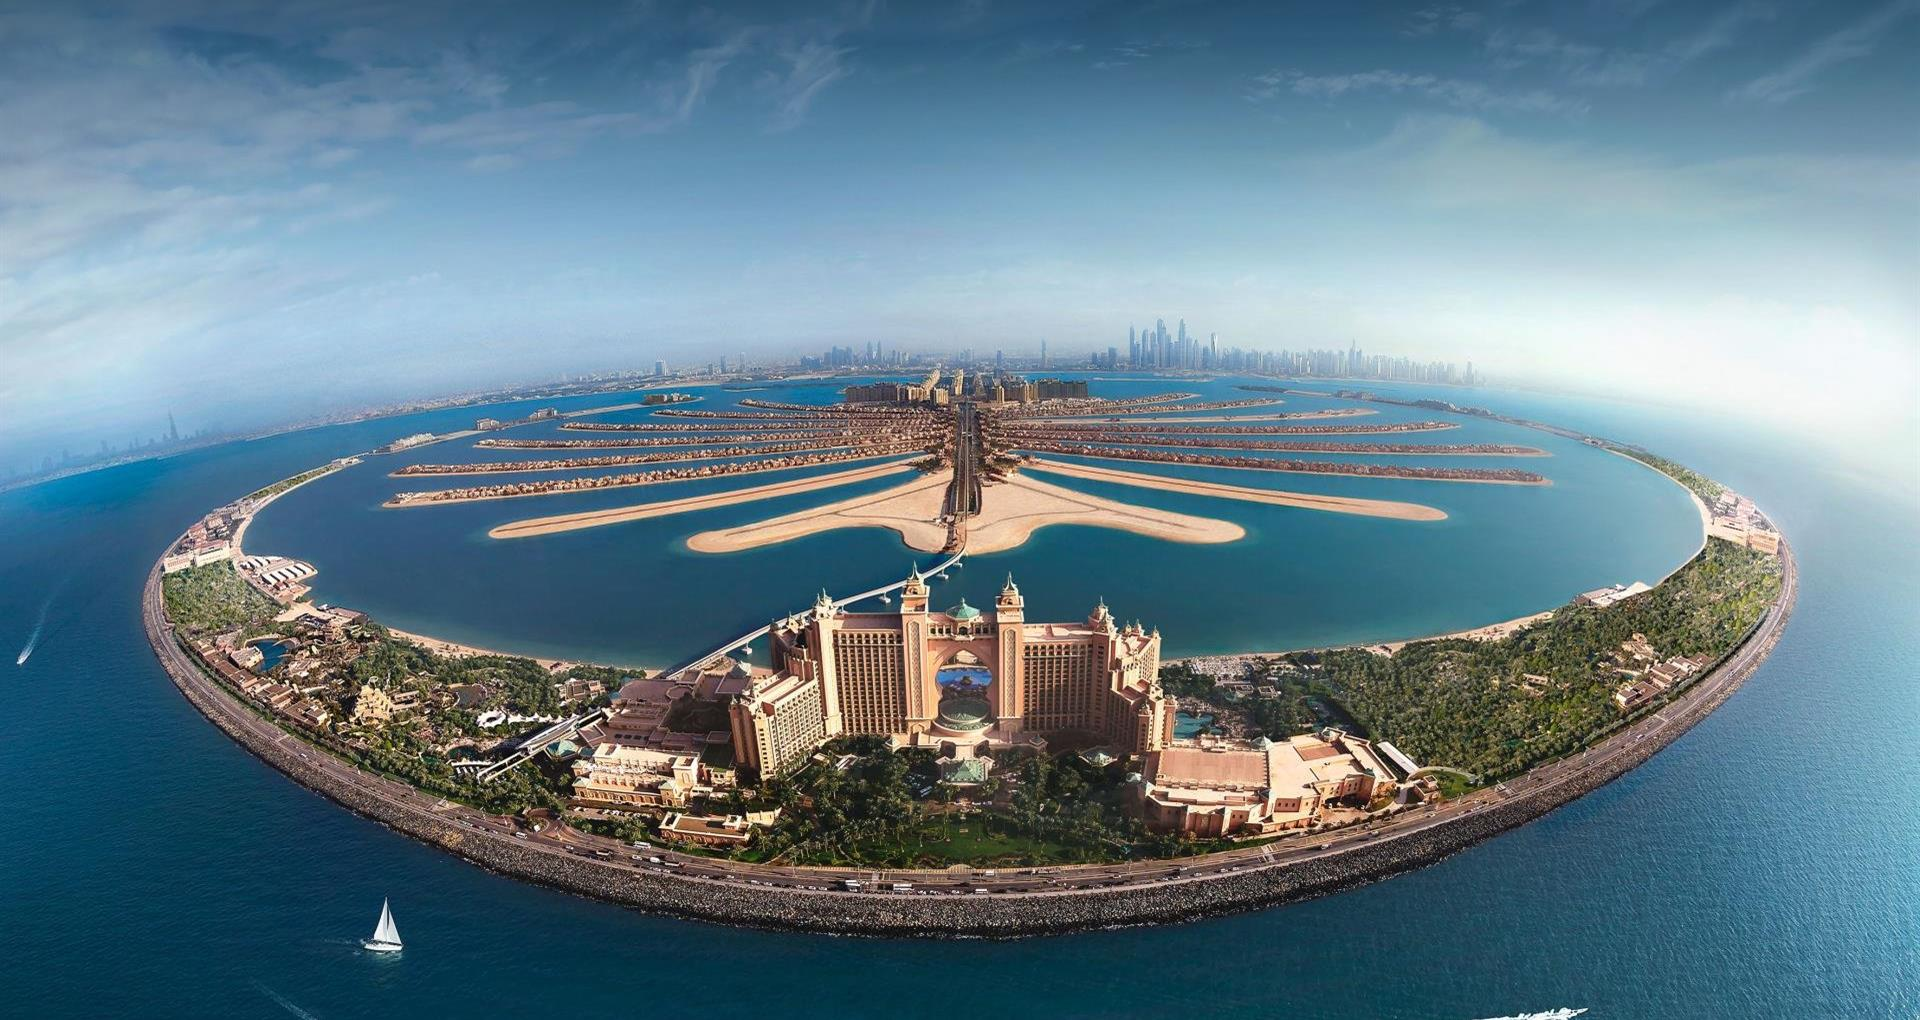 Achievements His Highness Sheikh Hamdan Bin Mohammed Bin Rashid Al Maktoum